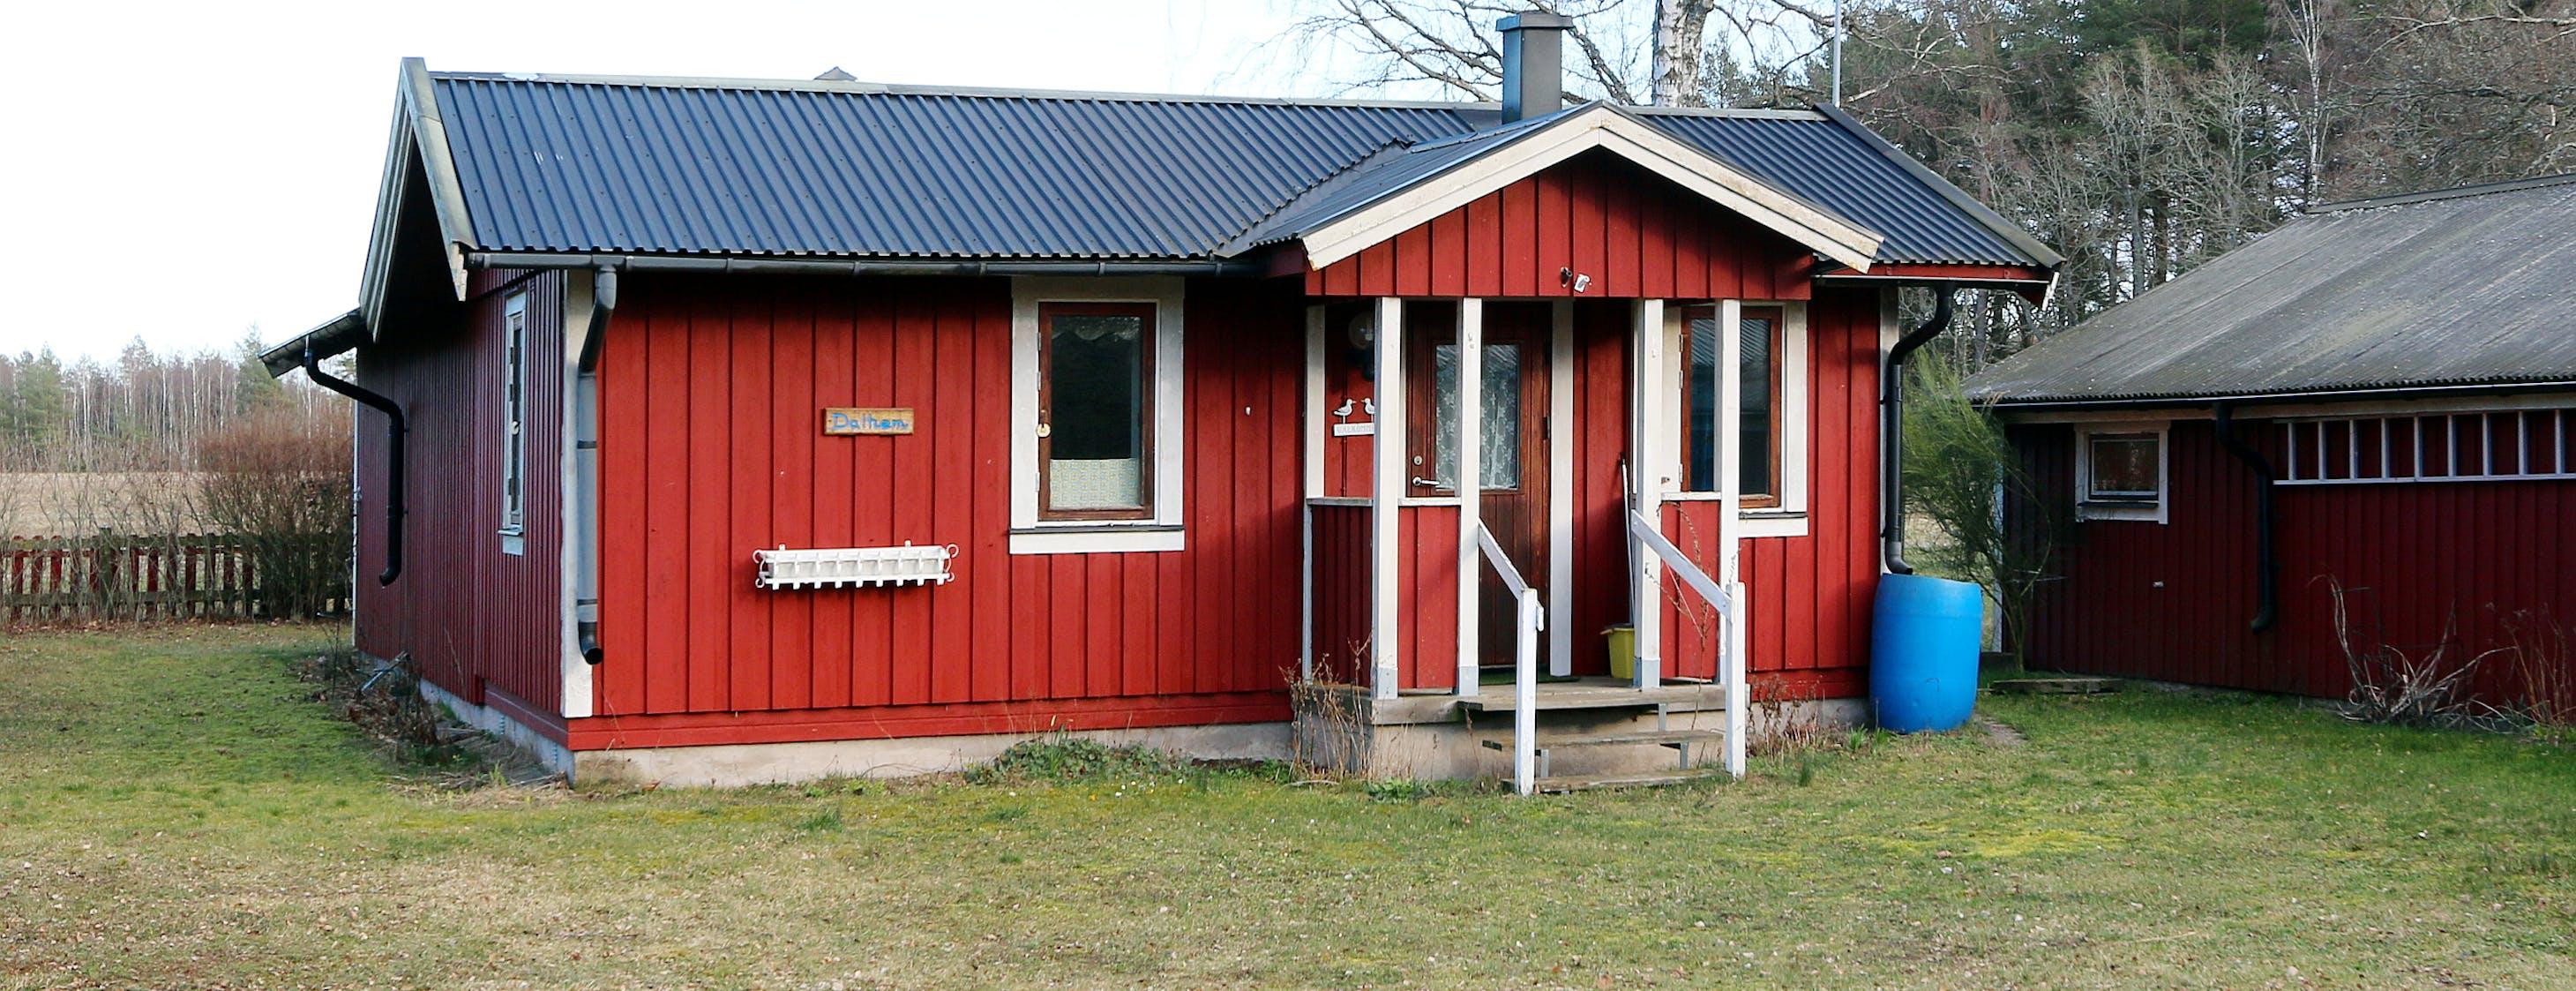 Lindbytallgatan 42 Lindby Tall